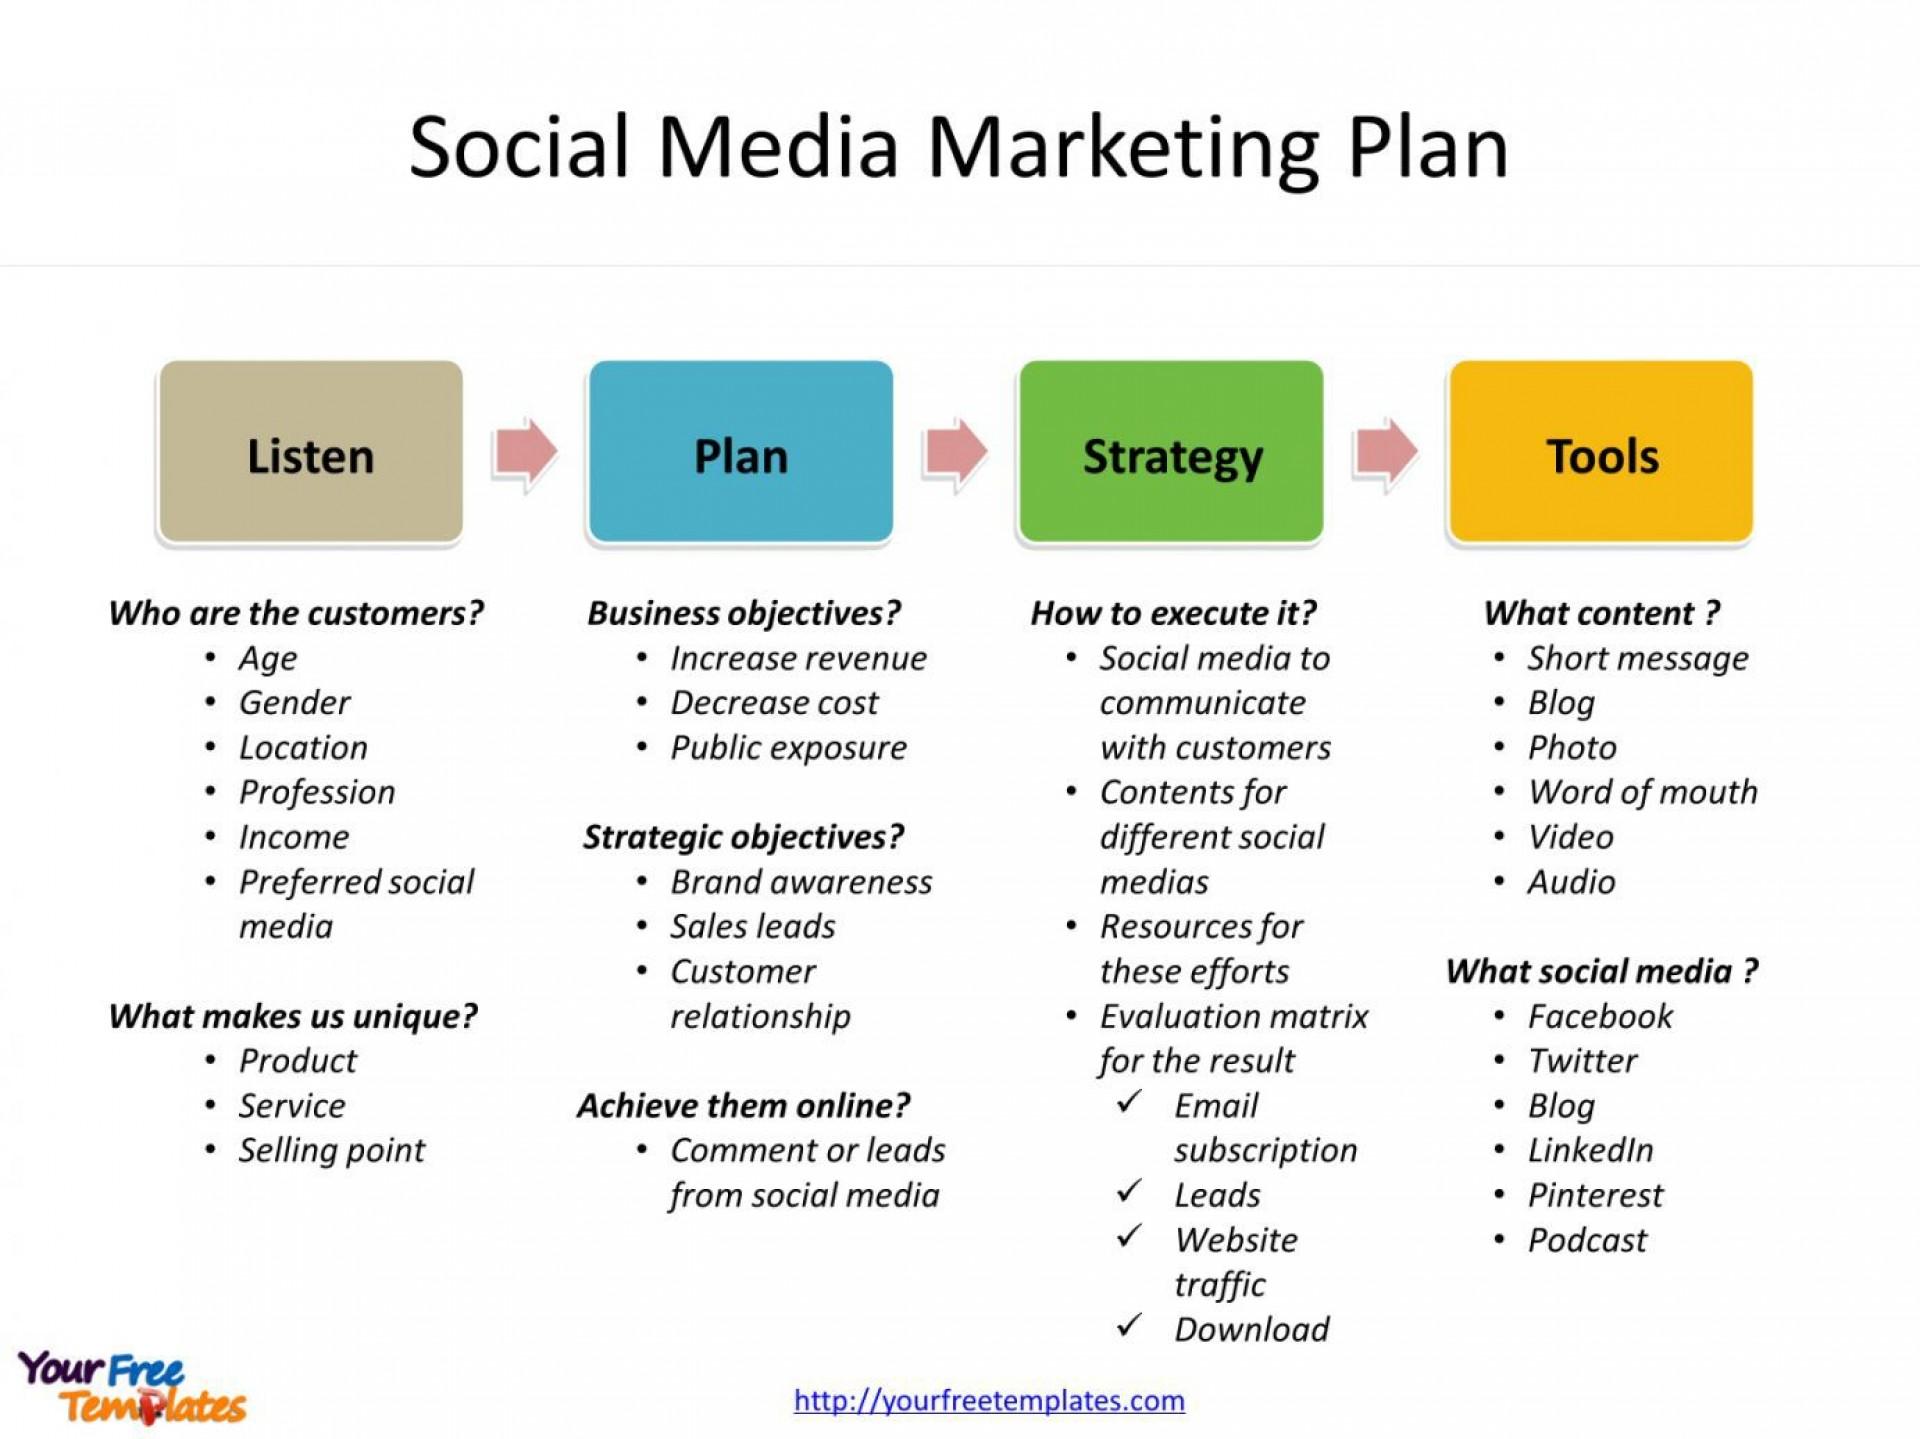 000 Fantastic Social Media Marketing Proposal Template Word High Resolution  Plan1920